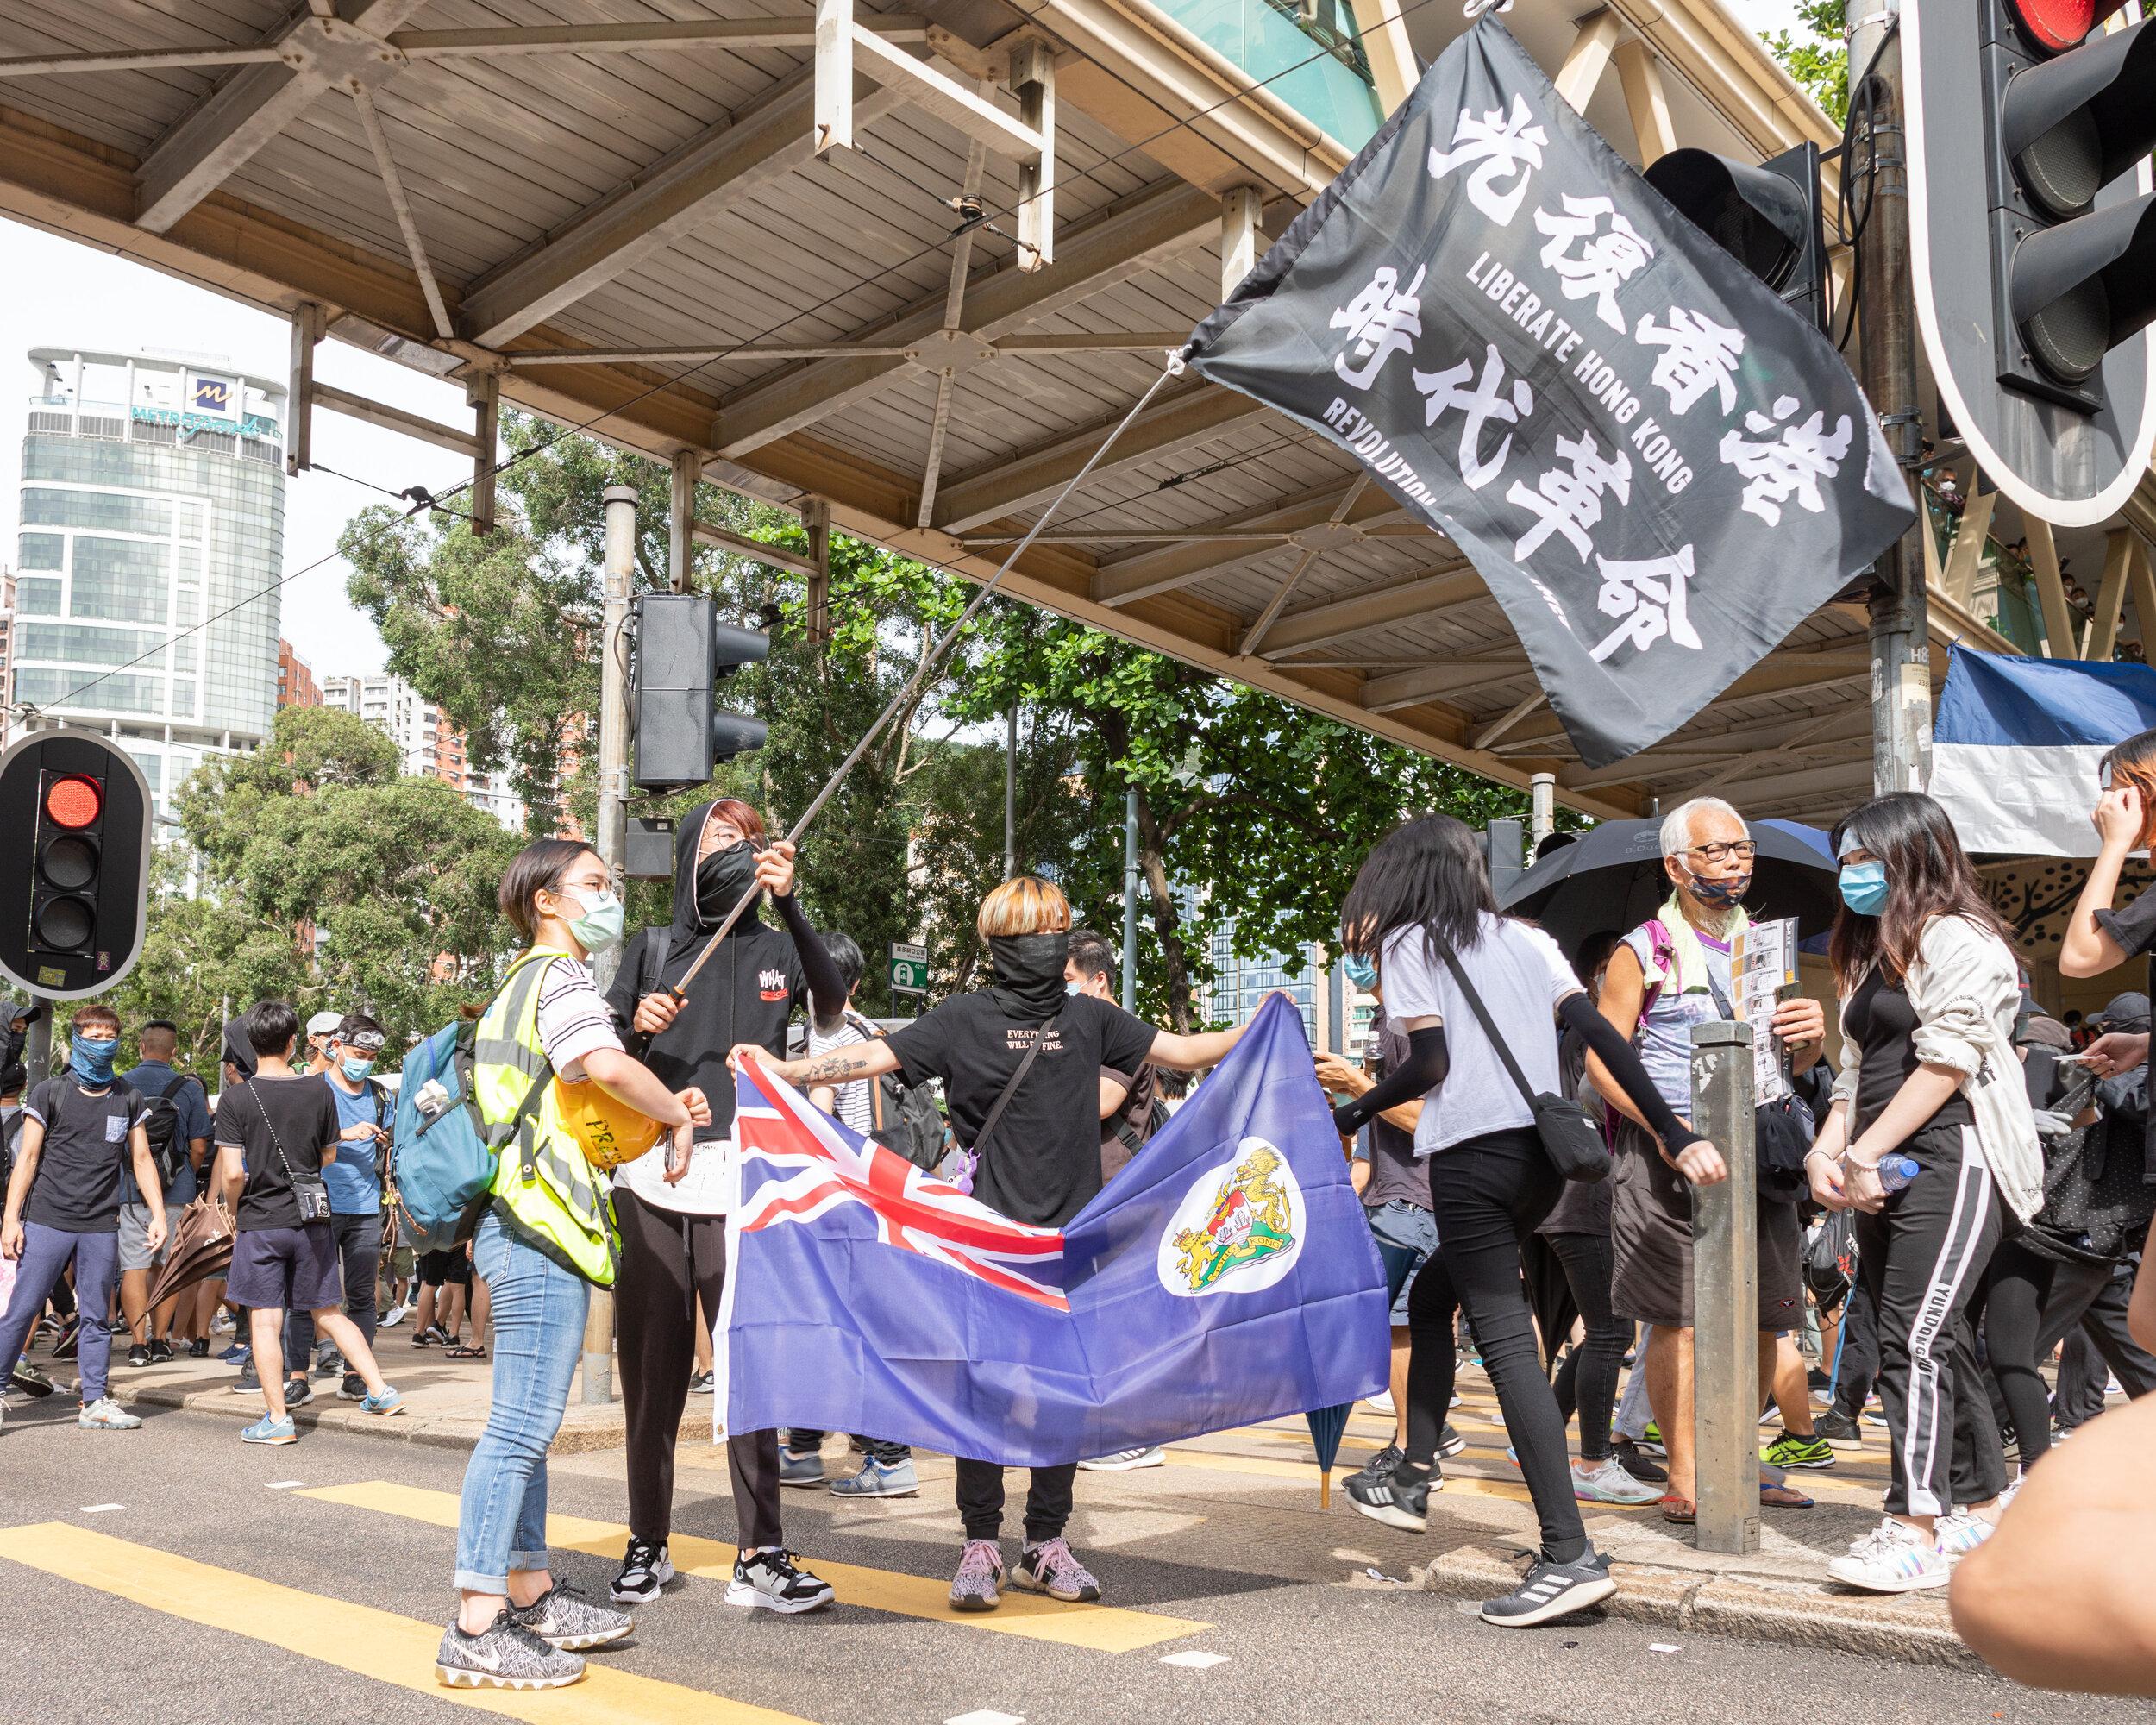 Tin Hau July 1st 2020 Hong Kong Protest Belinda Jiao.jpeg